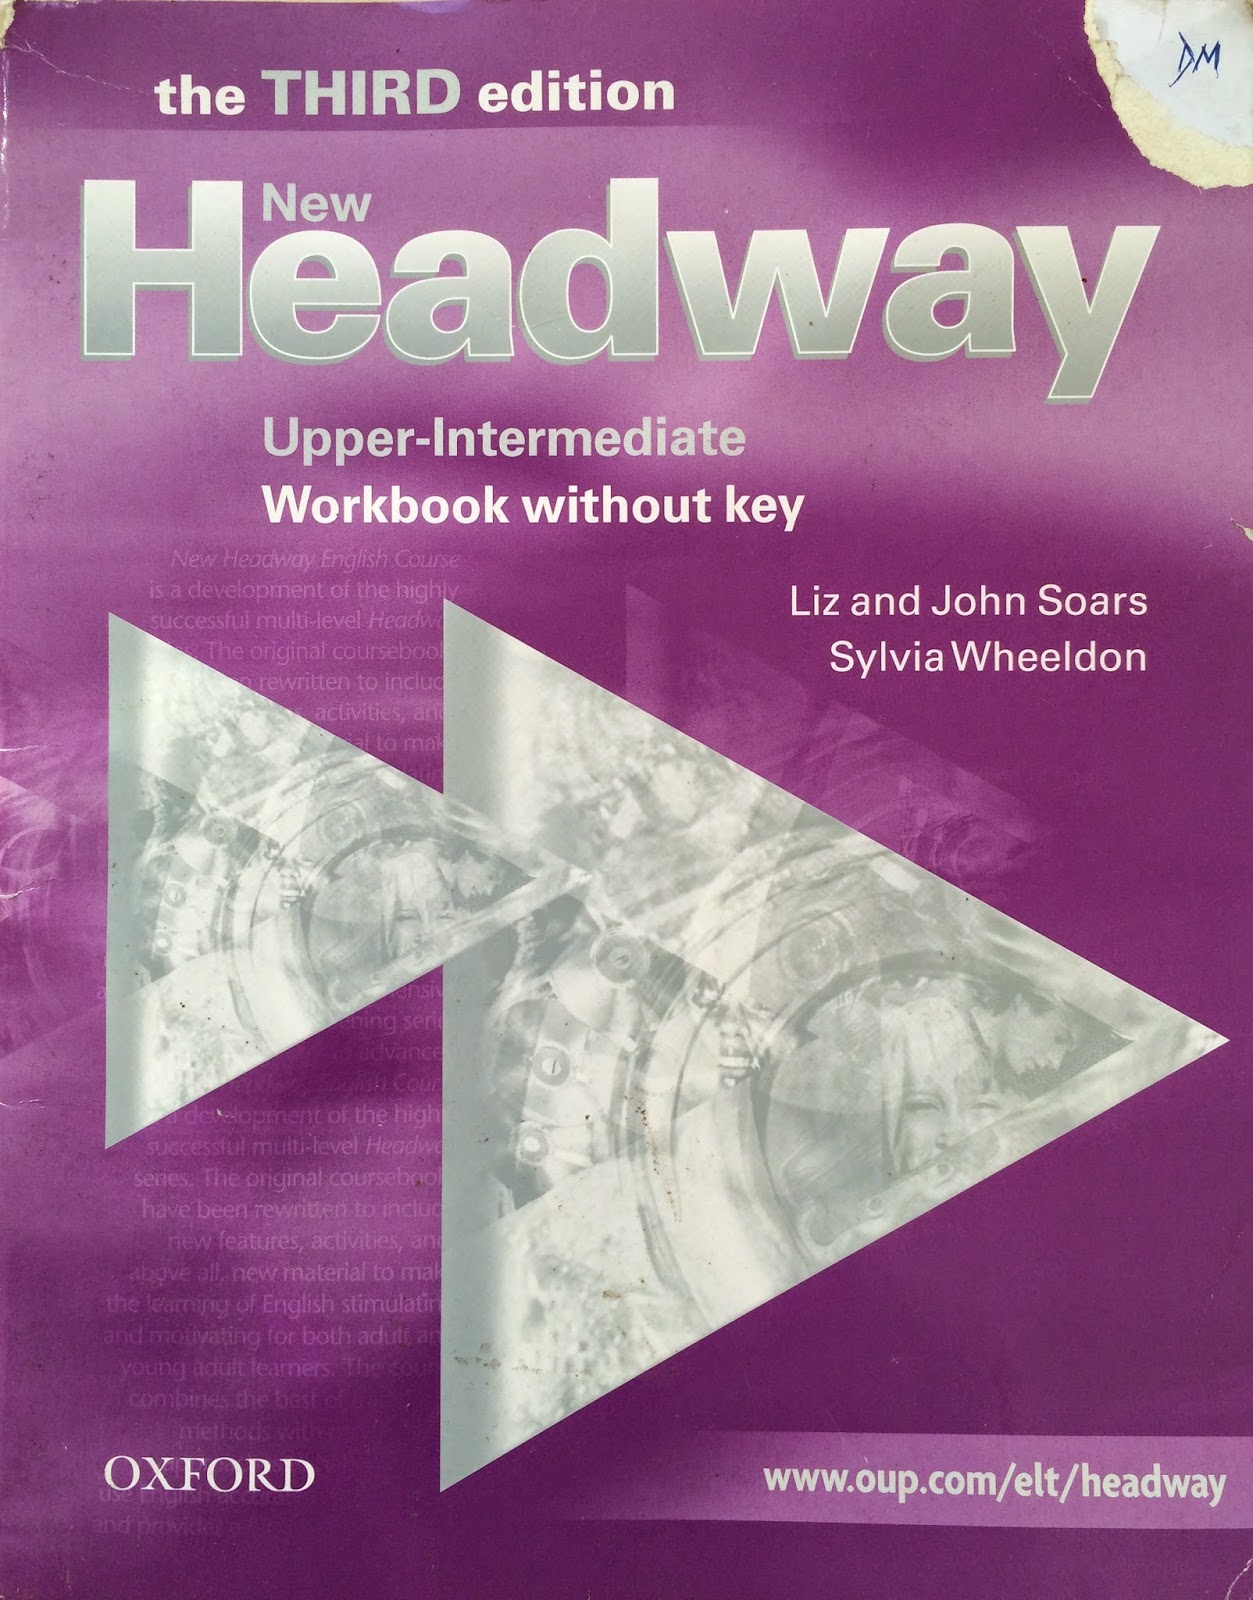 upper-intermediate headway edition решебник workbook third the